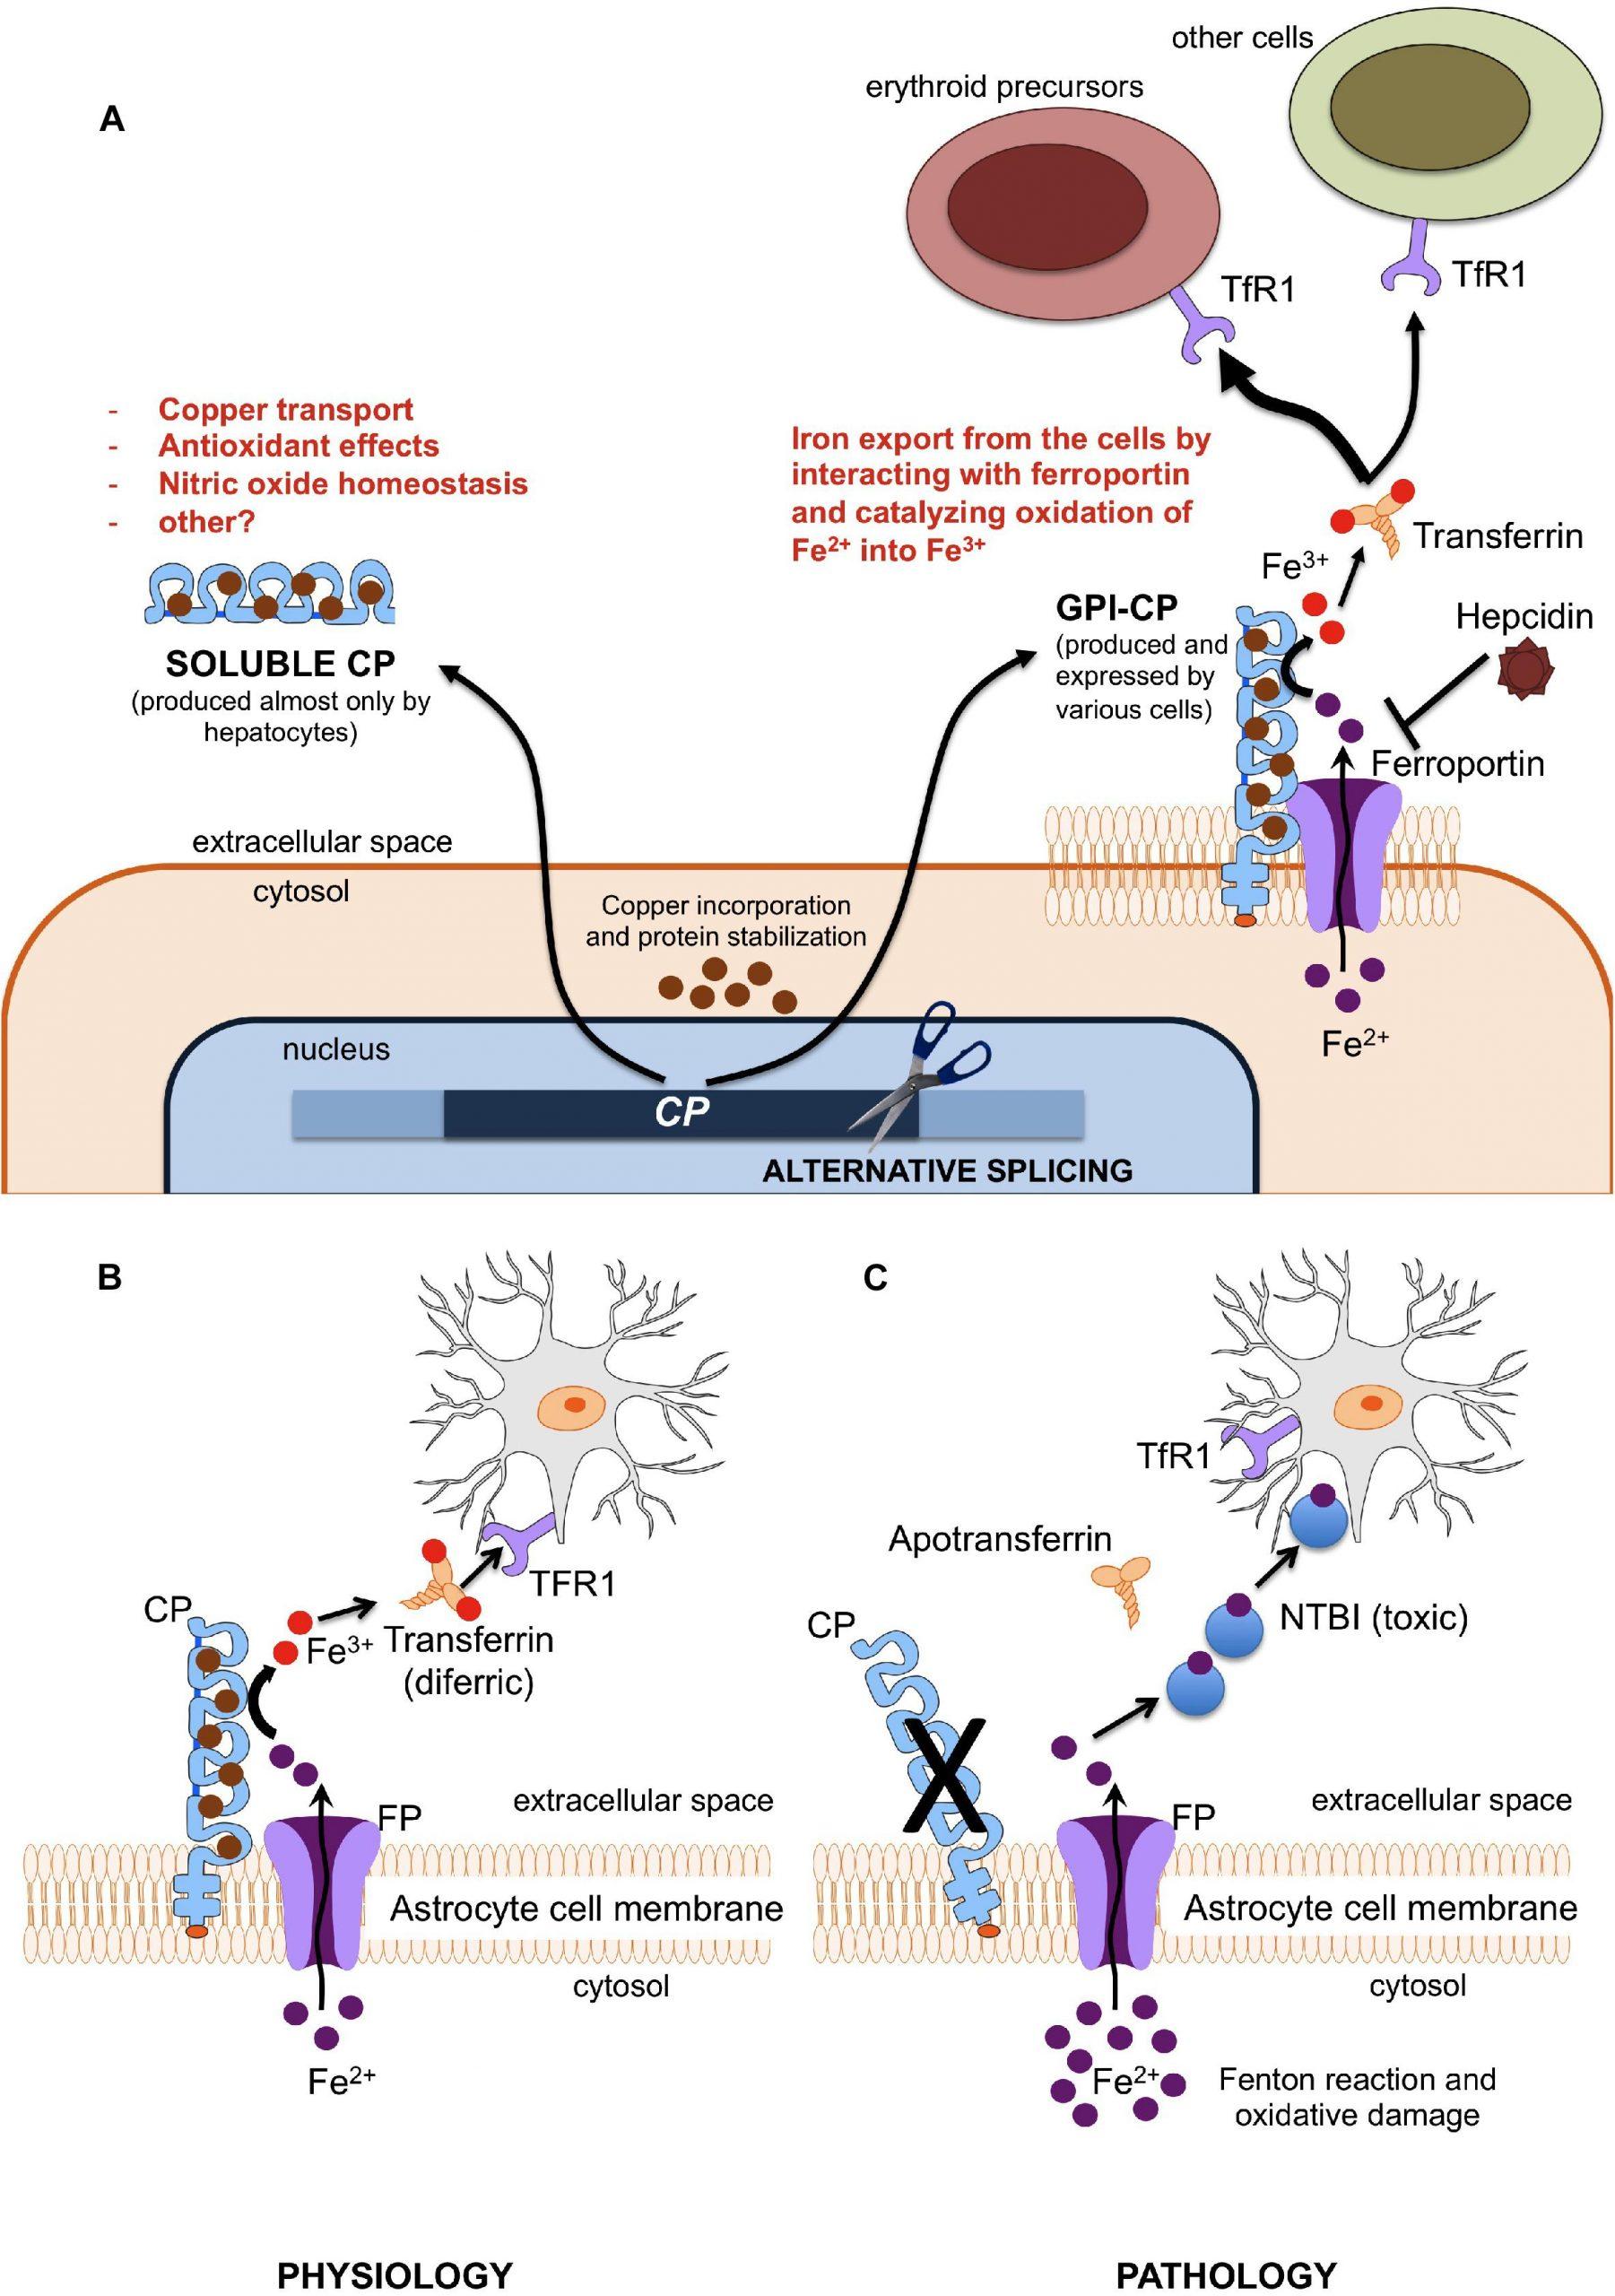 Frontiers | Aceruloplasminemia: A Severe Neurodegenerative pour Reproduction Figure Cp